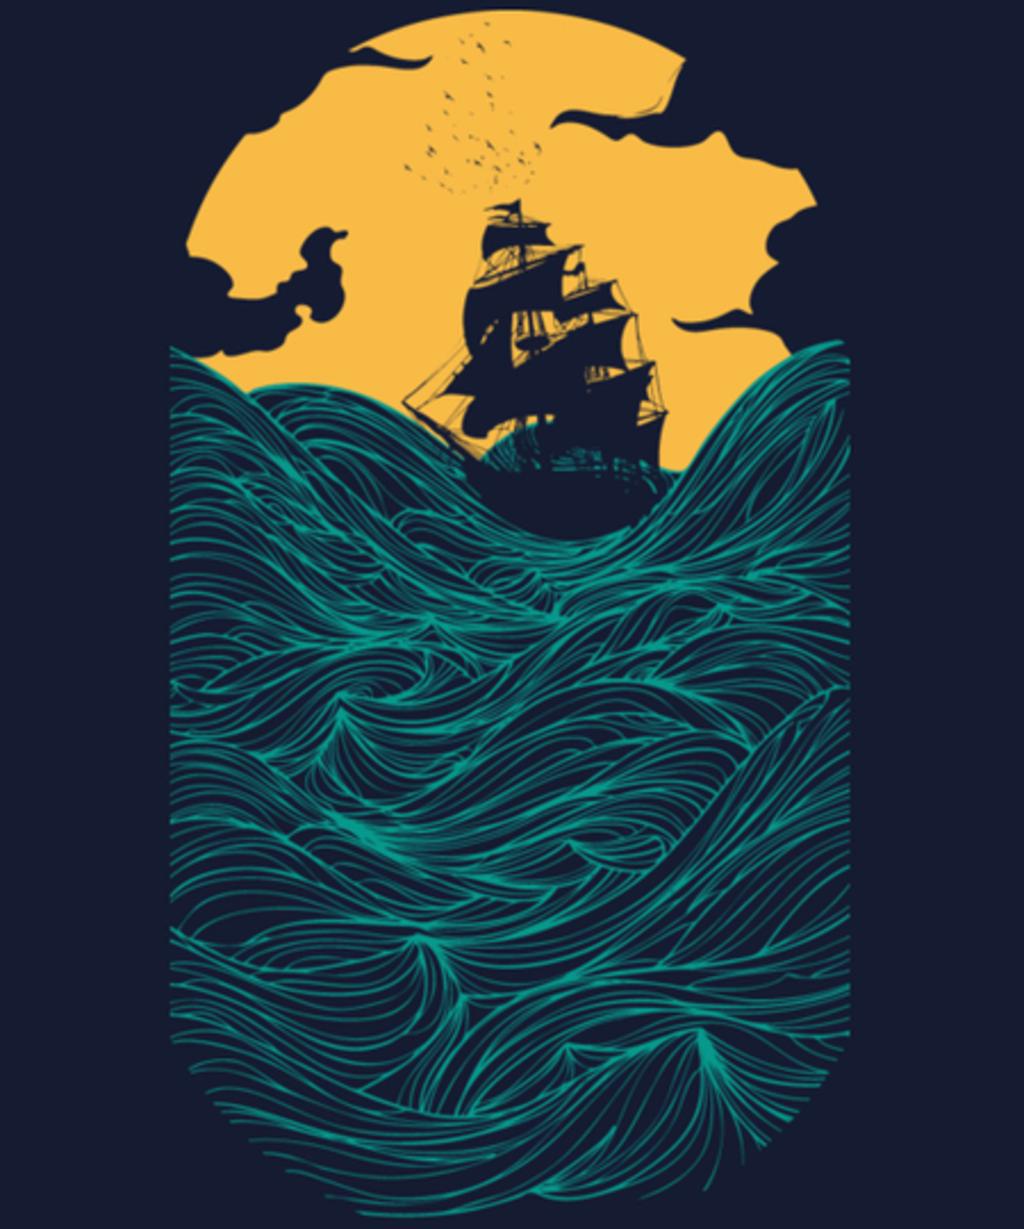 Qwertee: High seas